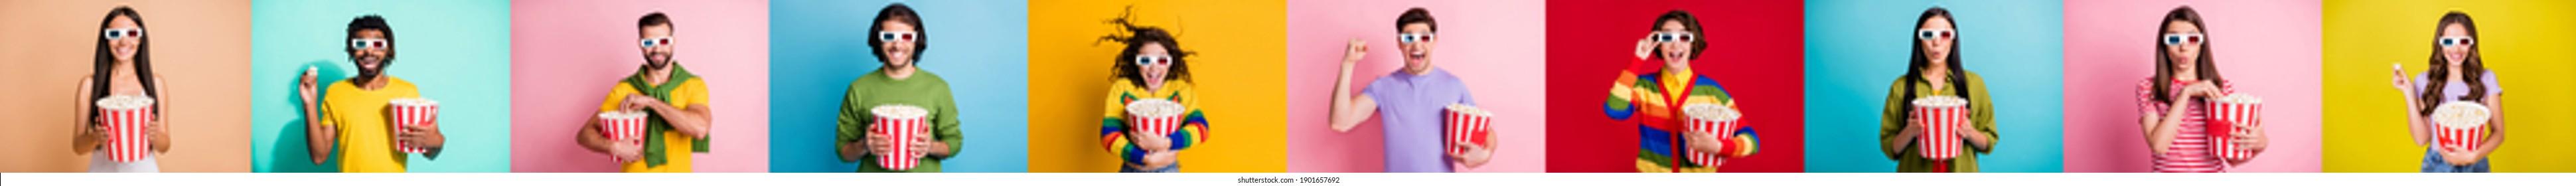 Photo set collage creative design many people watching new movie quarantine eat corns isolated colorful background